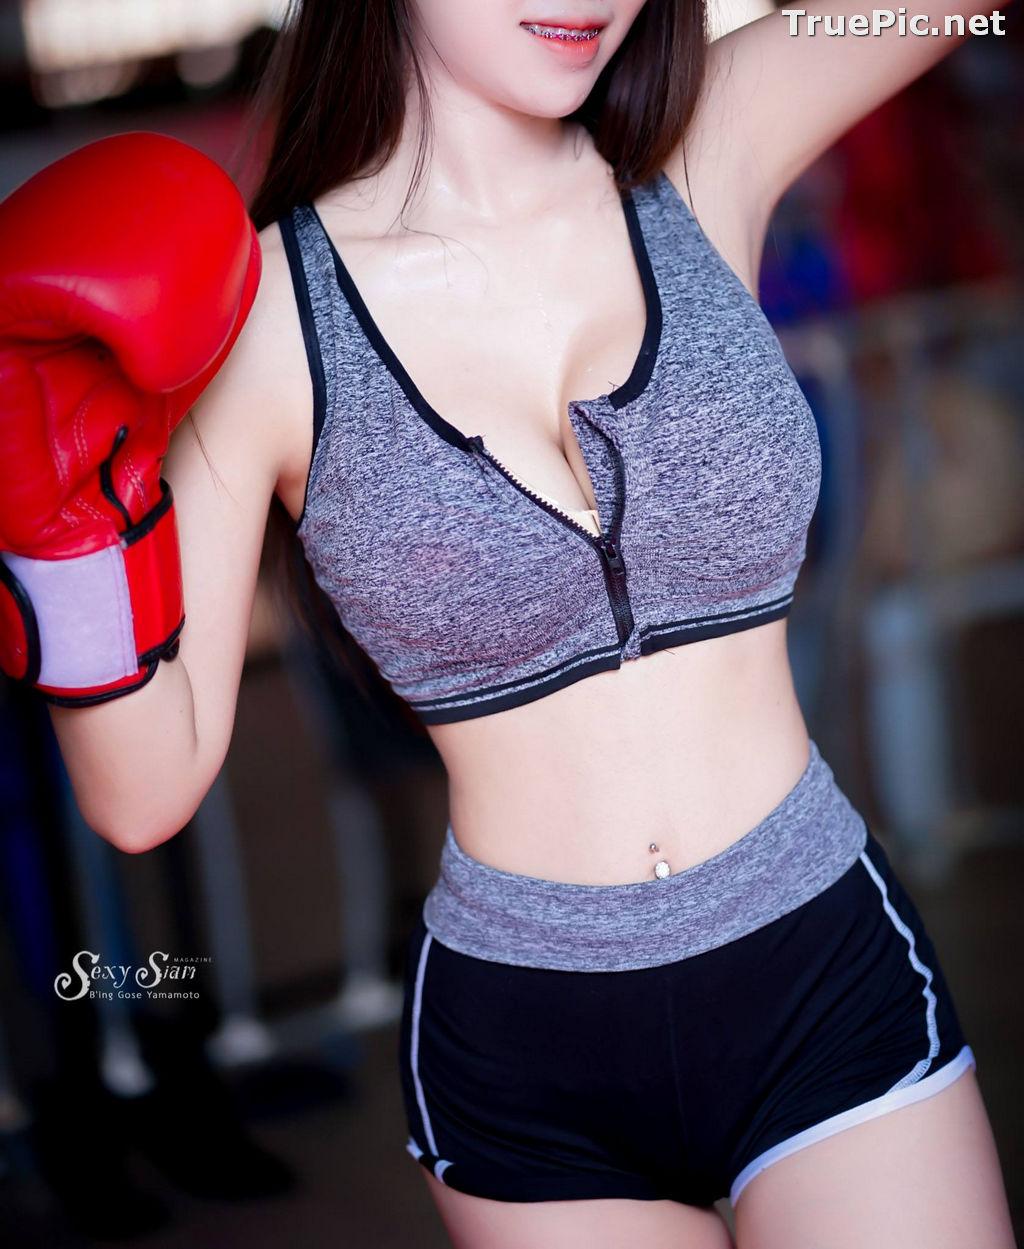 Image Thailand Model - Yotaka Suriya - Sexy Boxing Girl - TruePic.net - Picture-9